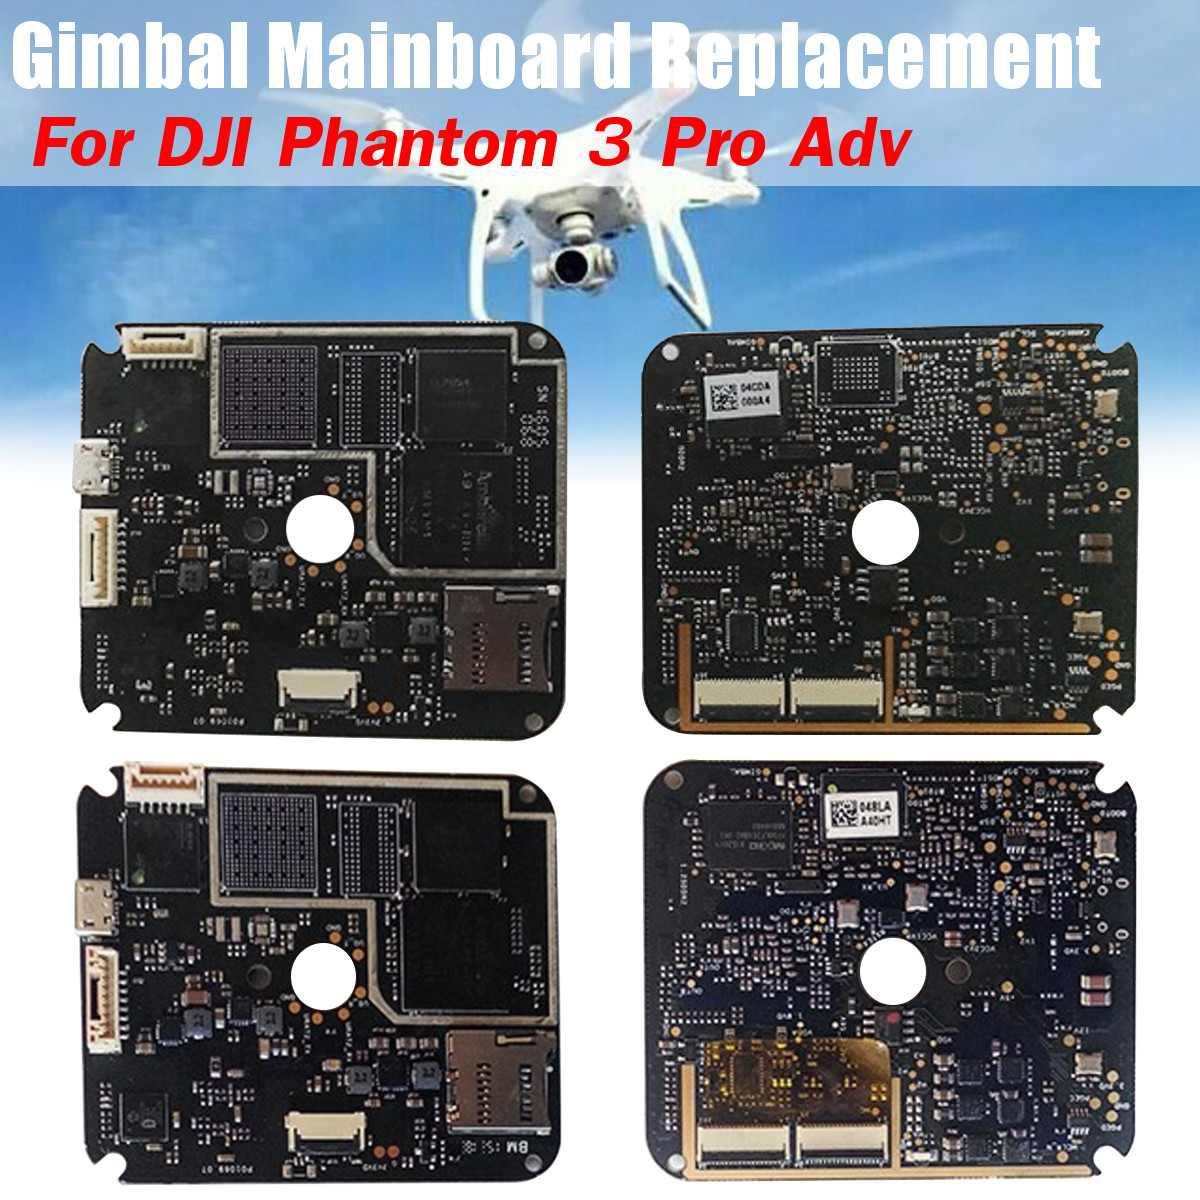 Repair Parts Gimbal Camera Forward Sensor Control Board Mainboard For Dji Phantom 3 Adv For Dji Phantom 3 Pro Drone Replacement